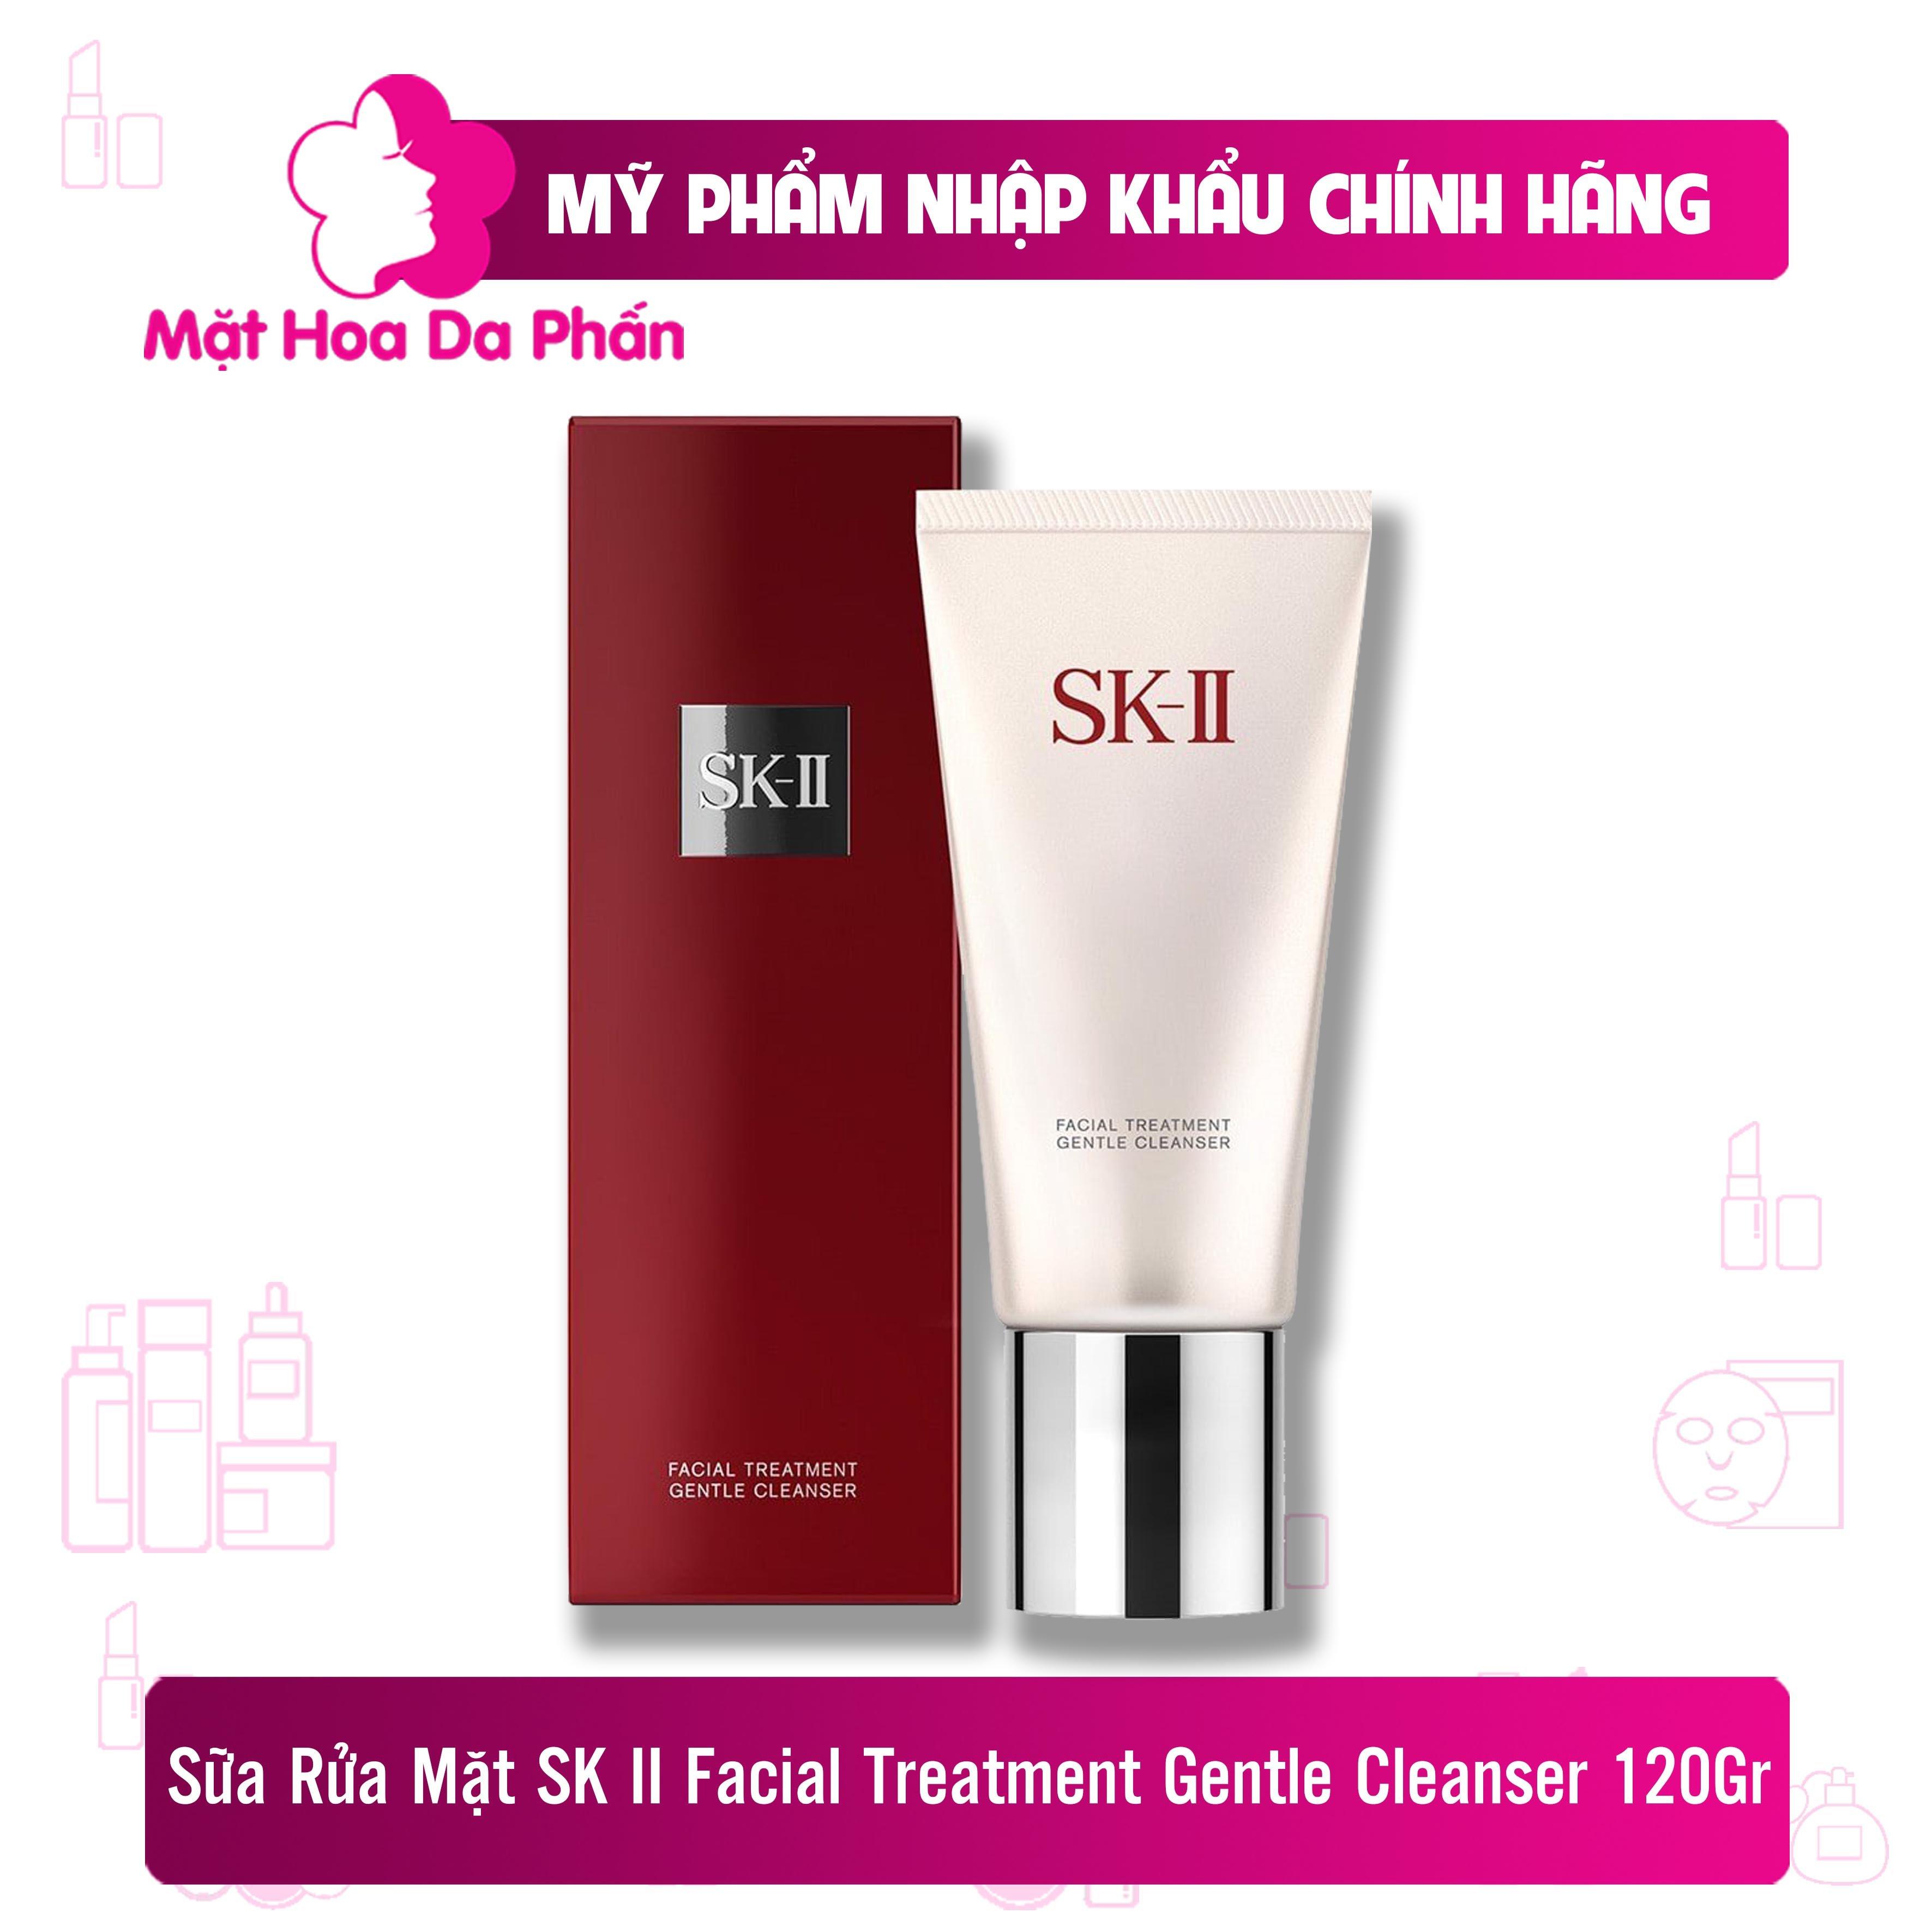 Sữa rửa mặt SK II Facial Treatment Gentle Cleanser 120G